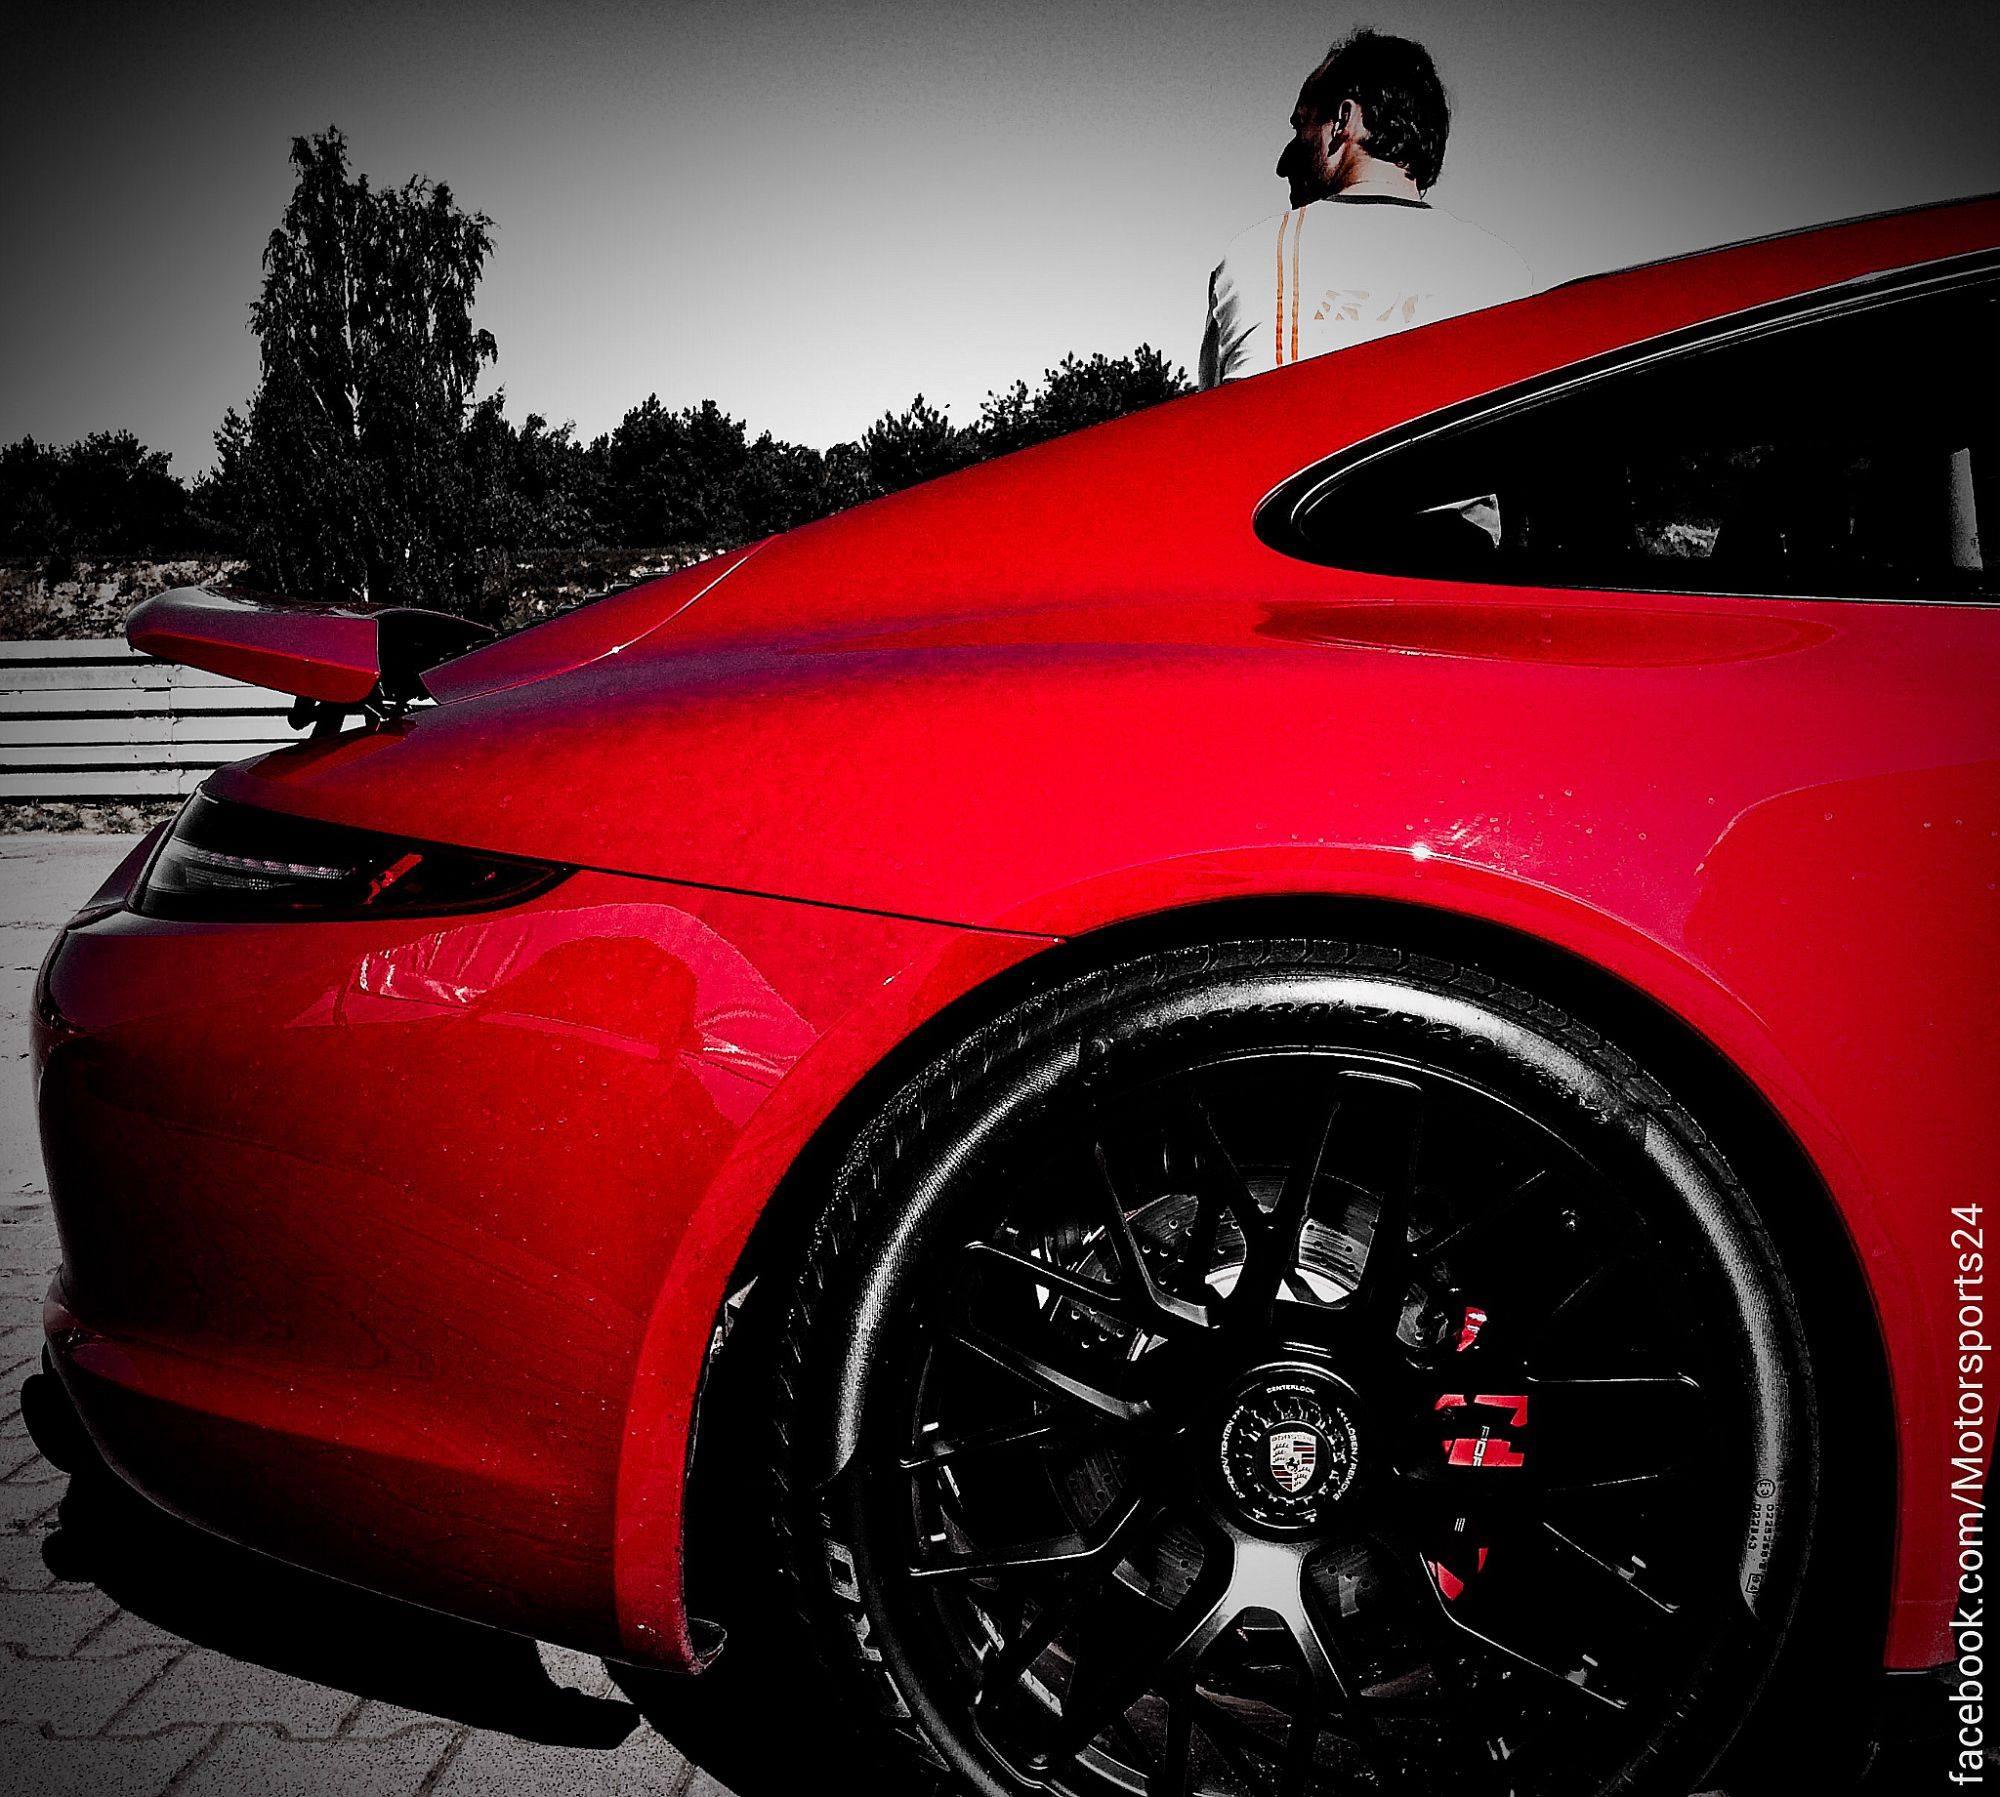 fot. Motorsports24